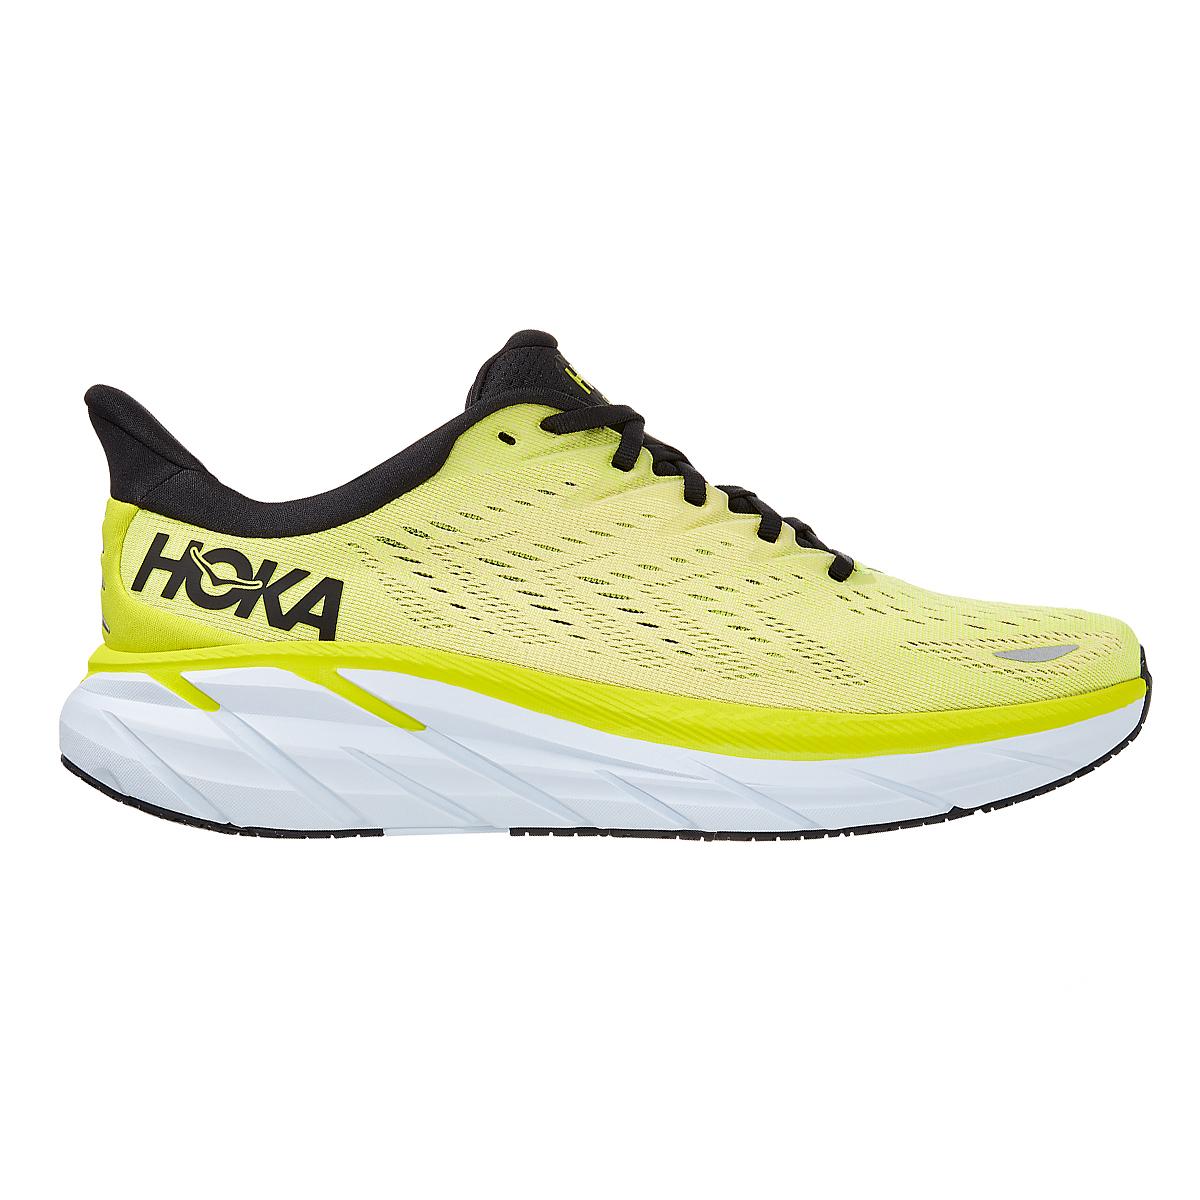 Men's Hoka One One Clifton 8 Running Shoe - Color: Evening Primrose/Charlock - Size: 7 - Width: Regular, Evening Primrose/Charlock, large, image 1